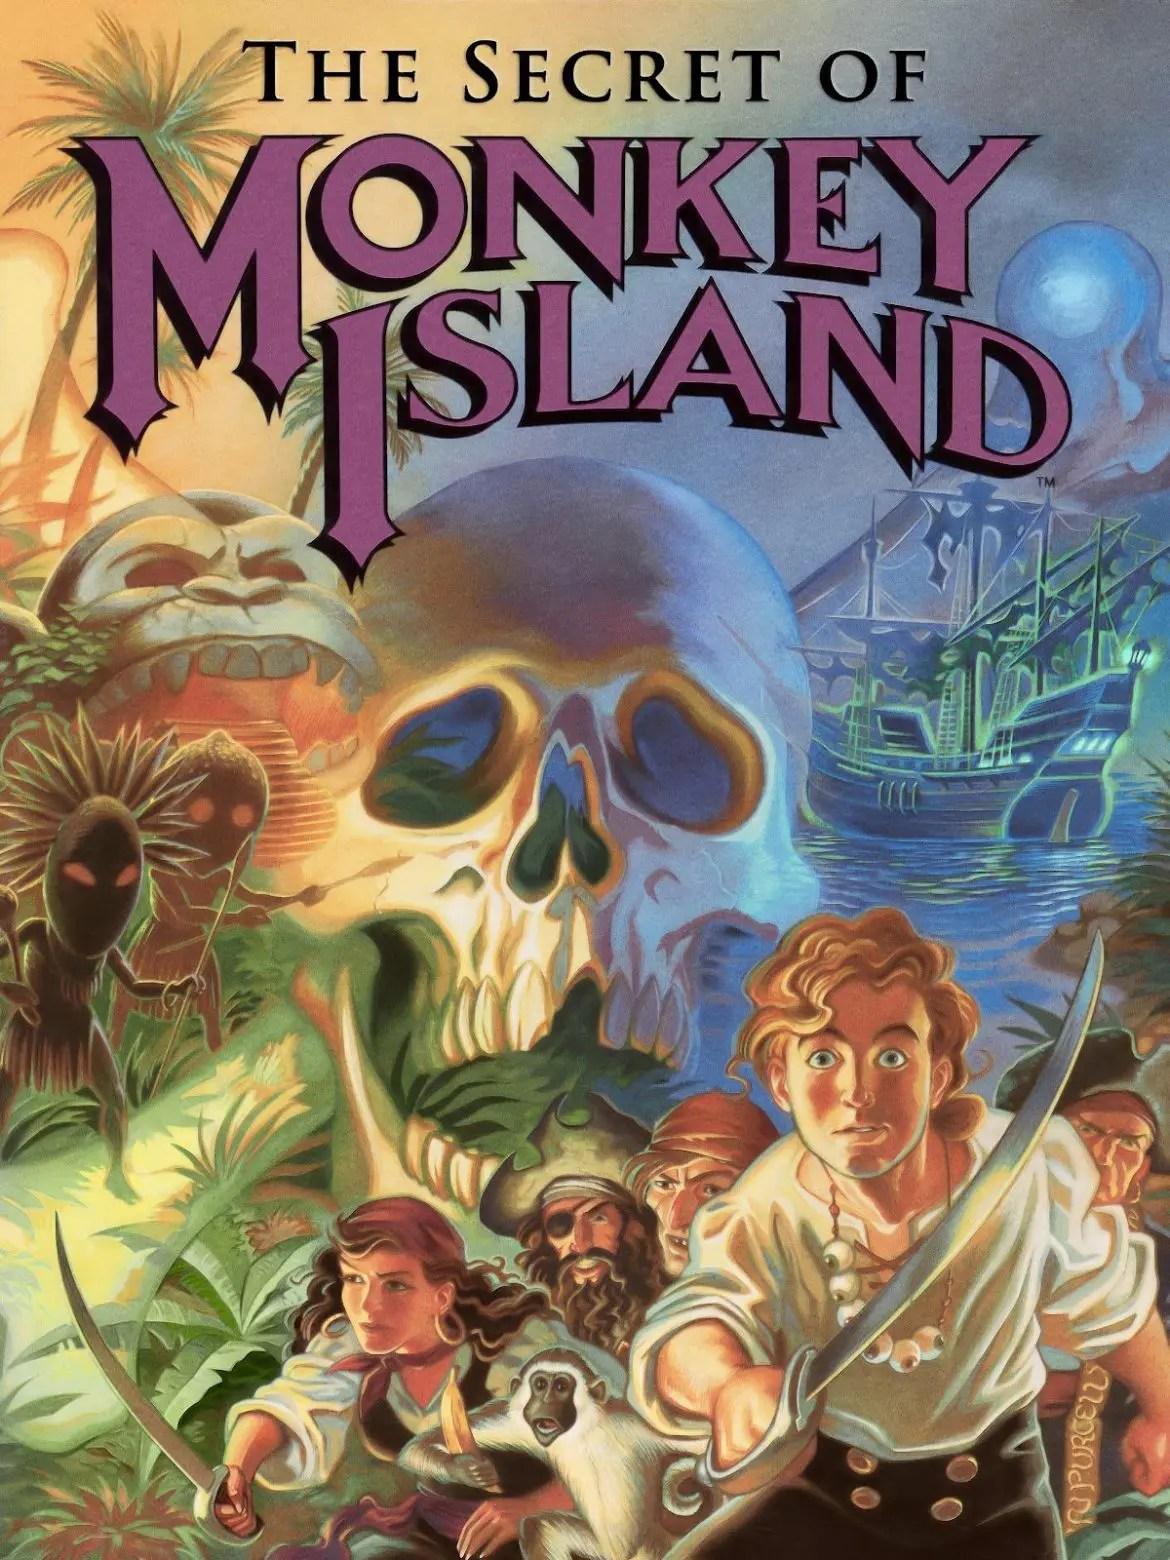 the-secret-of-monkey-island-cover